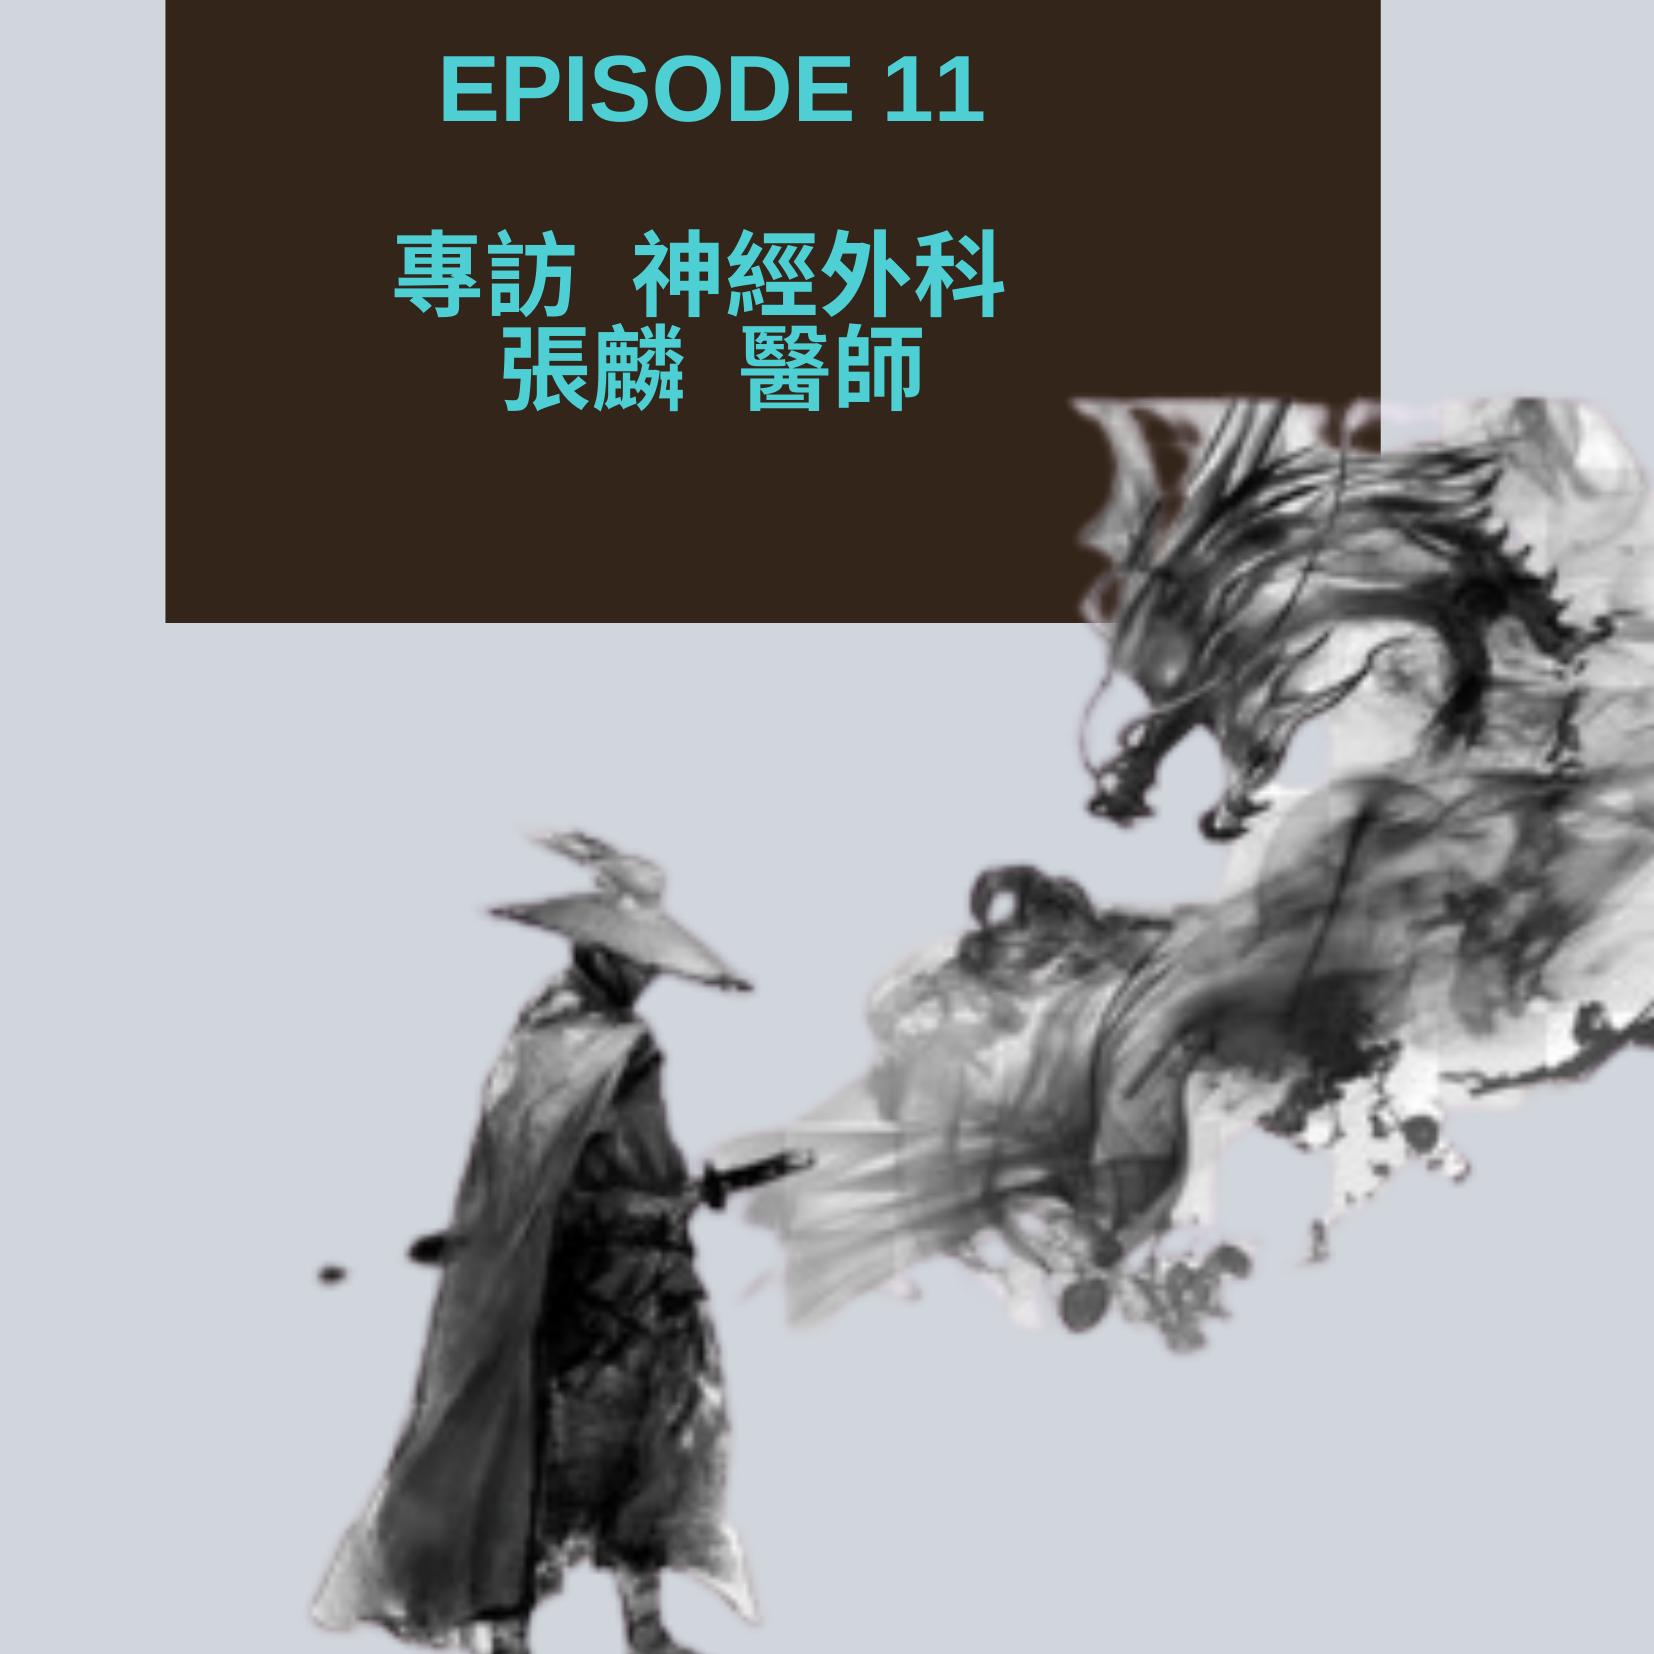 【Episode 11 : 專訪神經外科 張麟醫師】